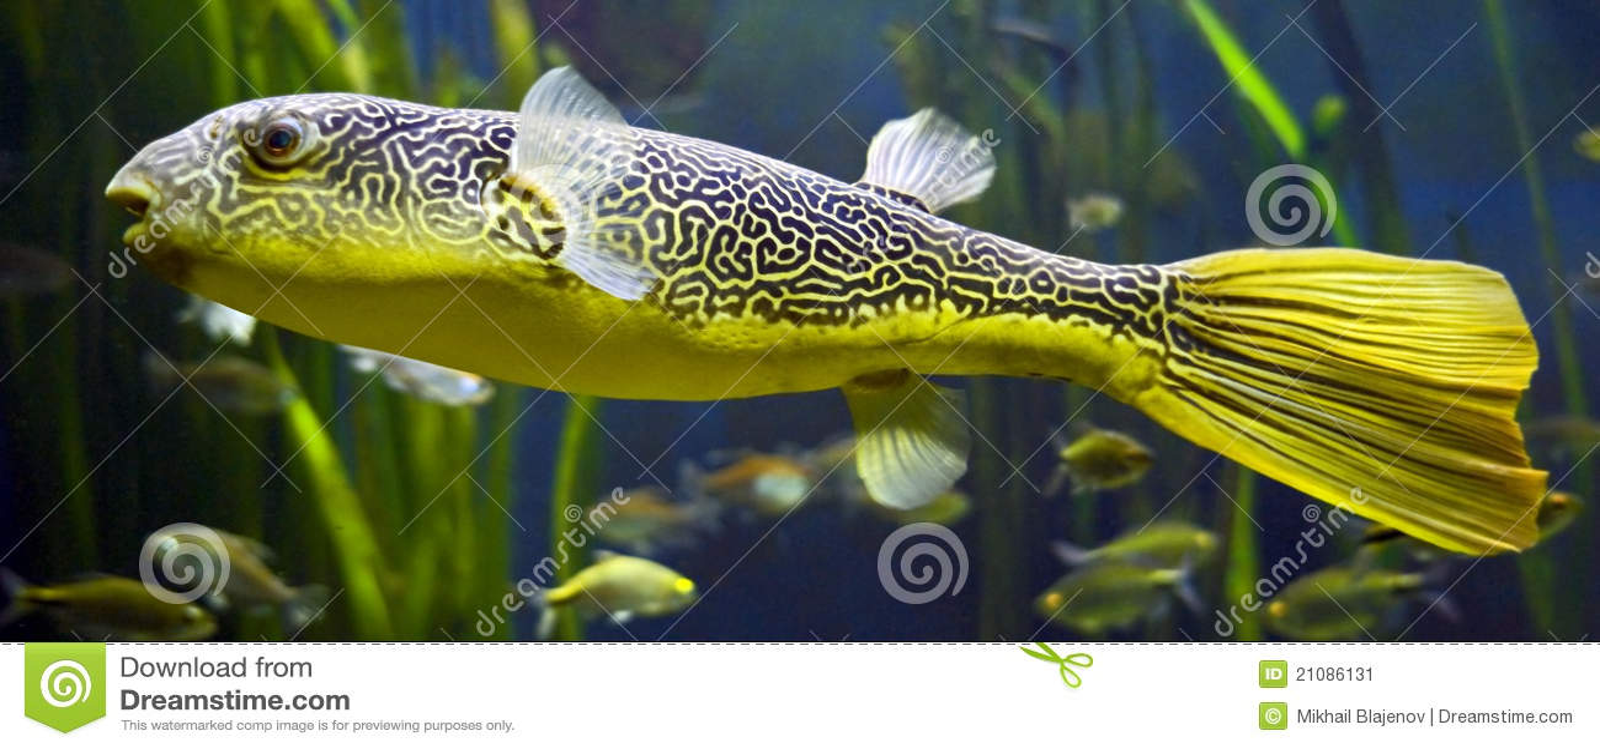 Freshwater Puffer 4 Stock Image Image Of Fish Puffer